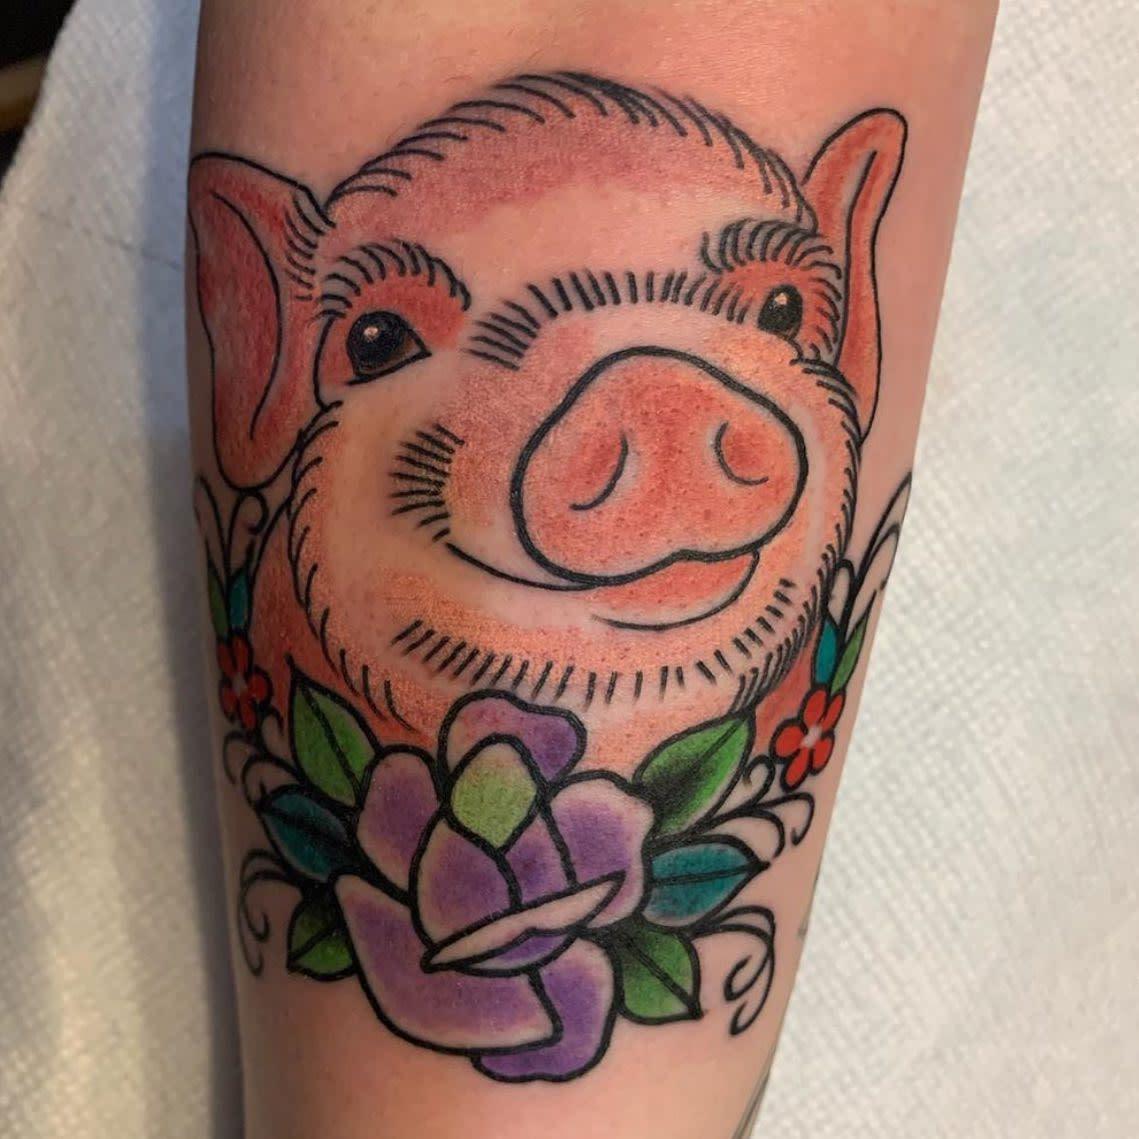 Traditionelles veganes Tattoo -springst_tattoo